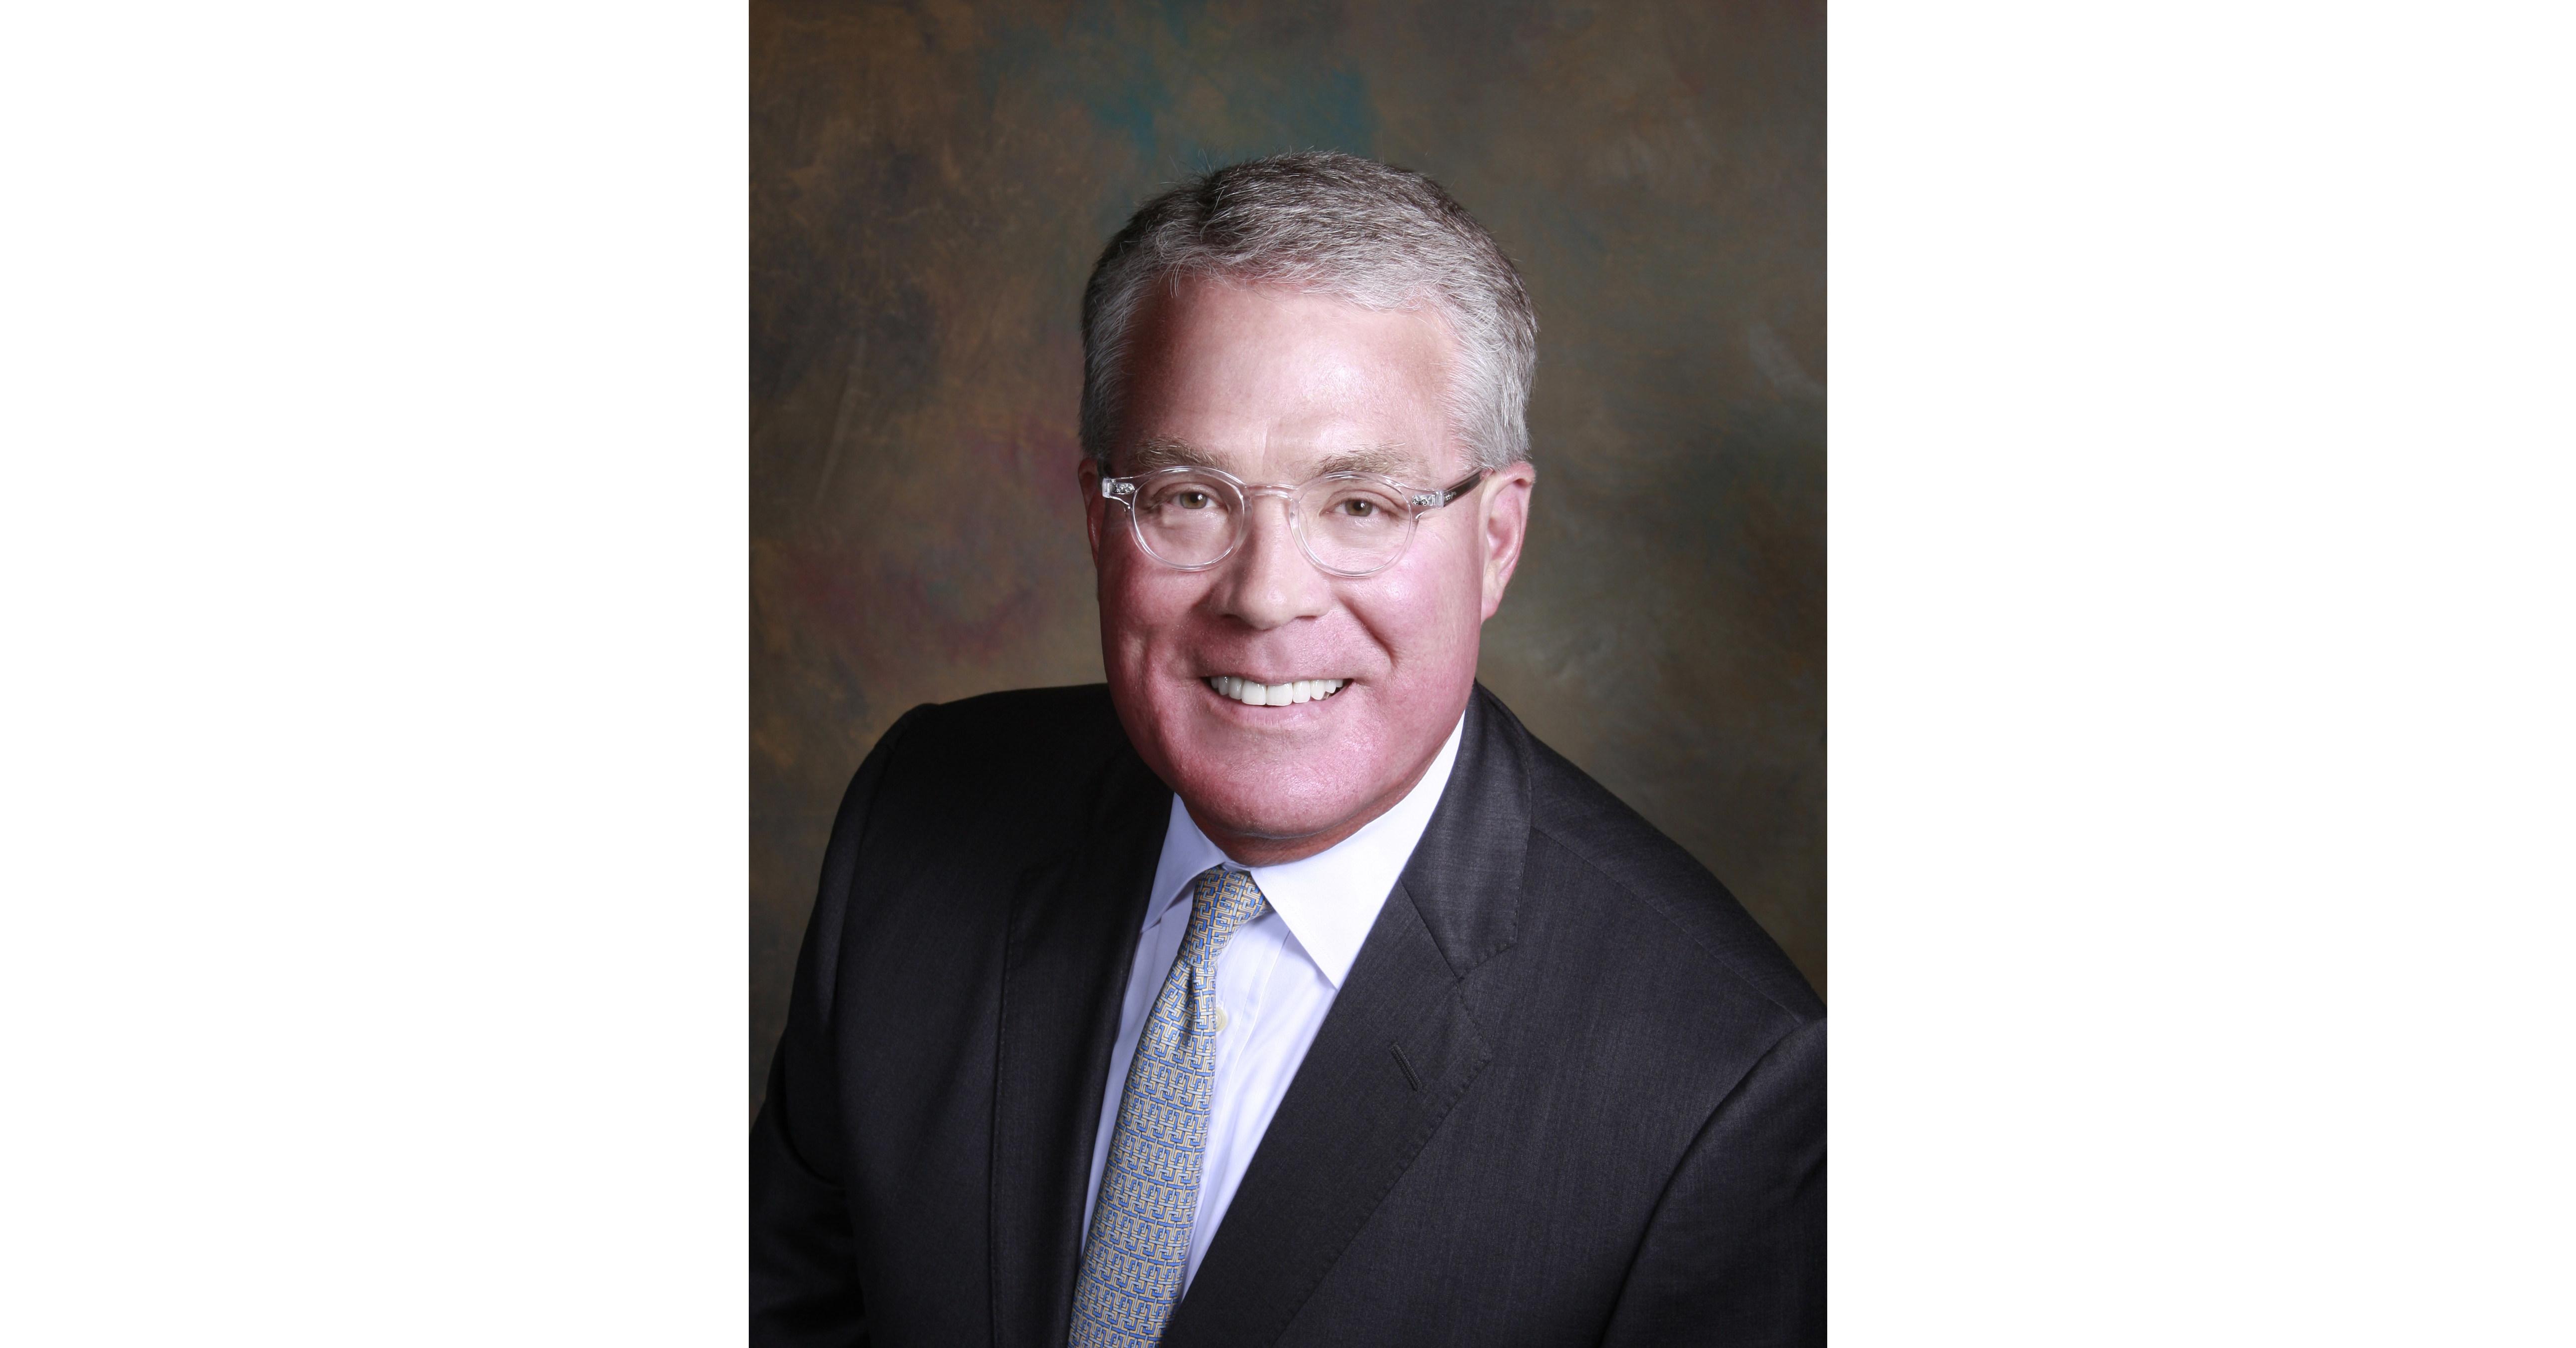 Mediator Don Philbin Ranked in Chambers USA 2019